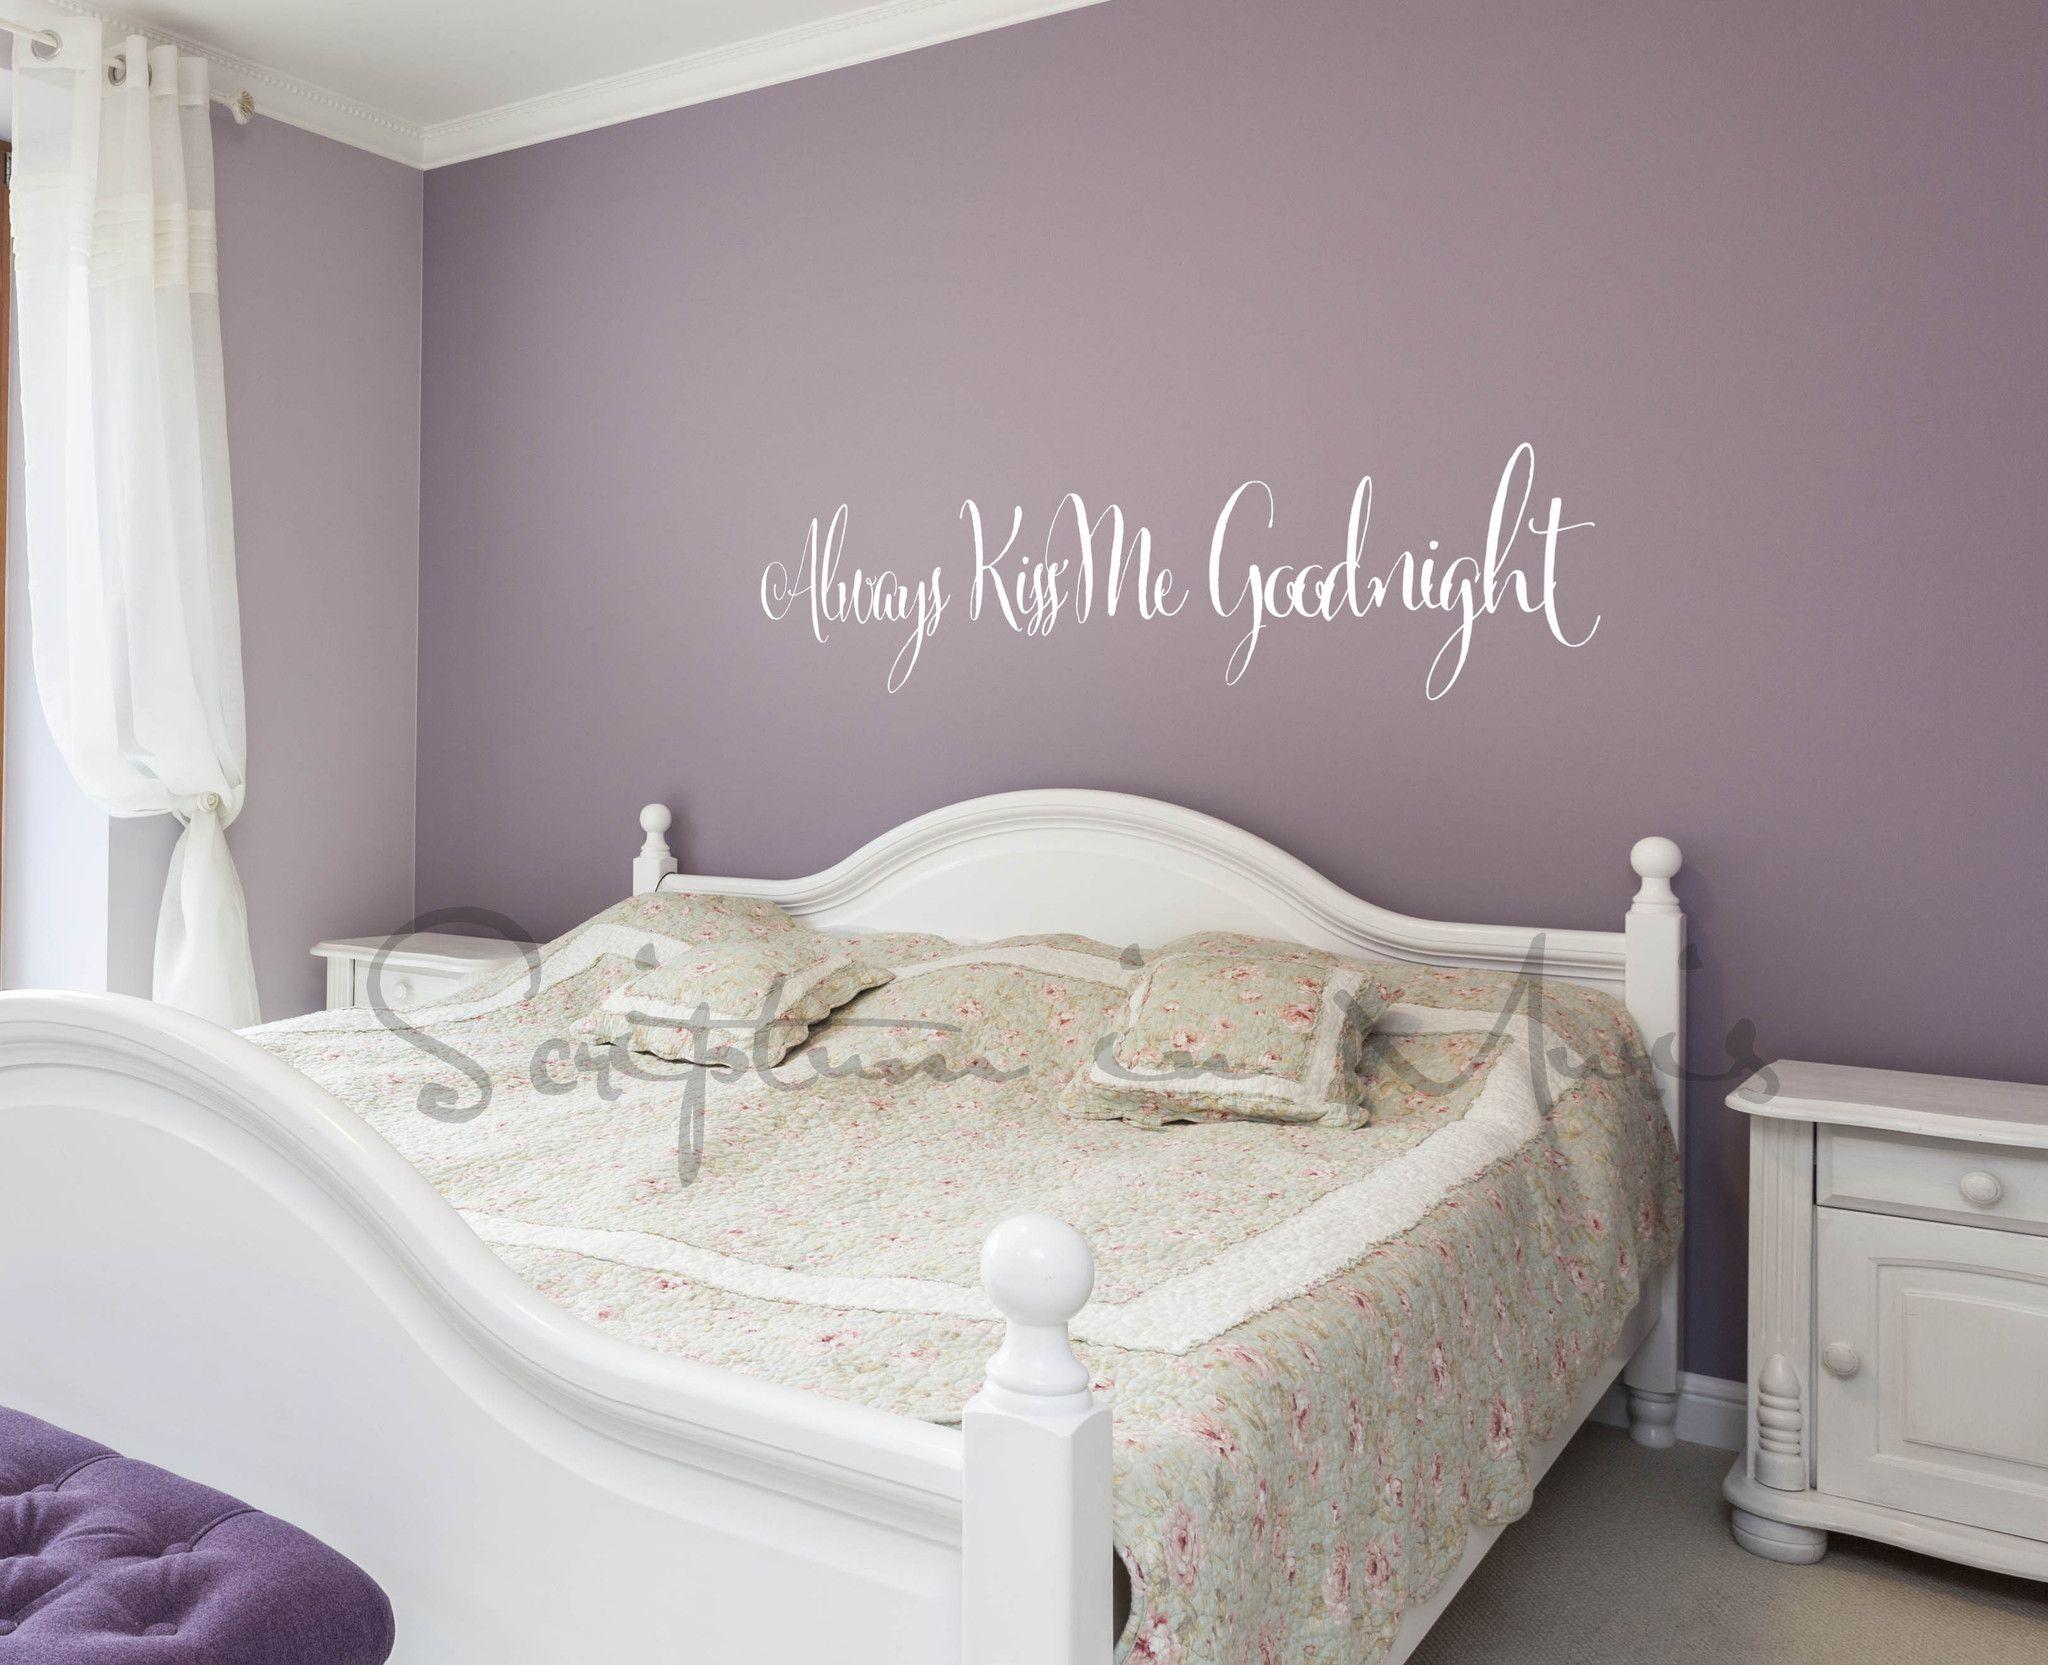 Always Kiss Me Goodnight Bedroom Vinyl Wall Decal Things I Love Bedroom Paint Colors